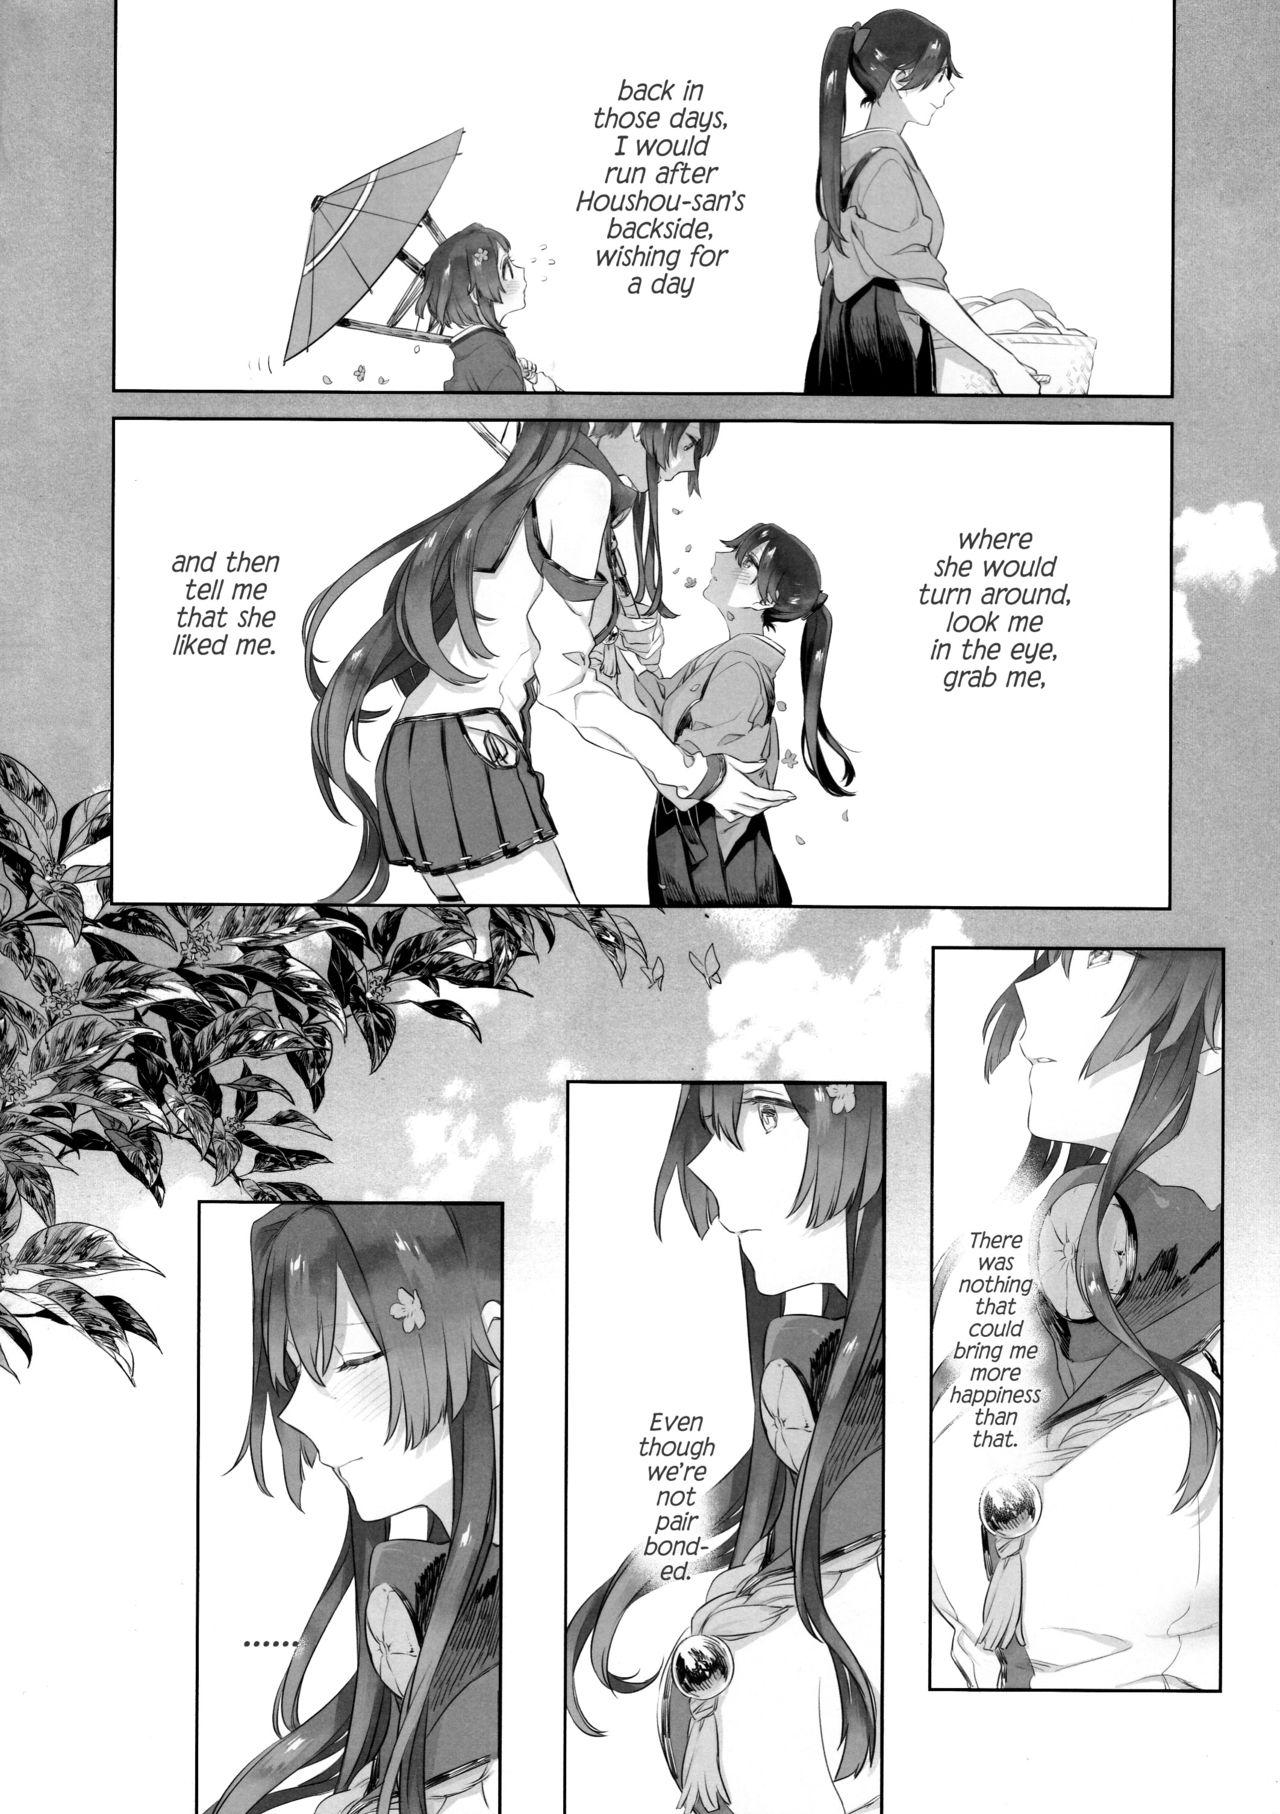 Ameagari no Hanayome - She became my bride after the rain. 8